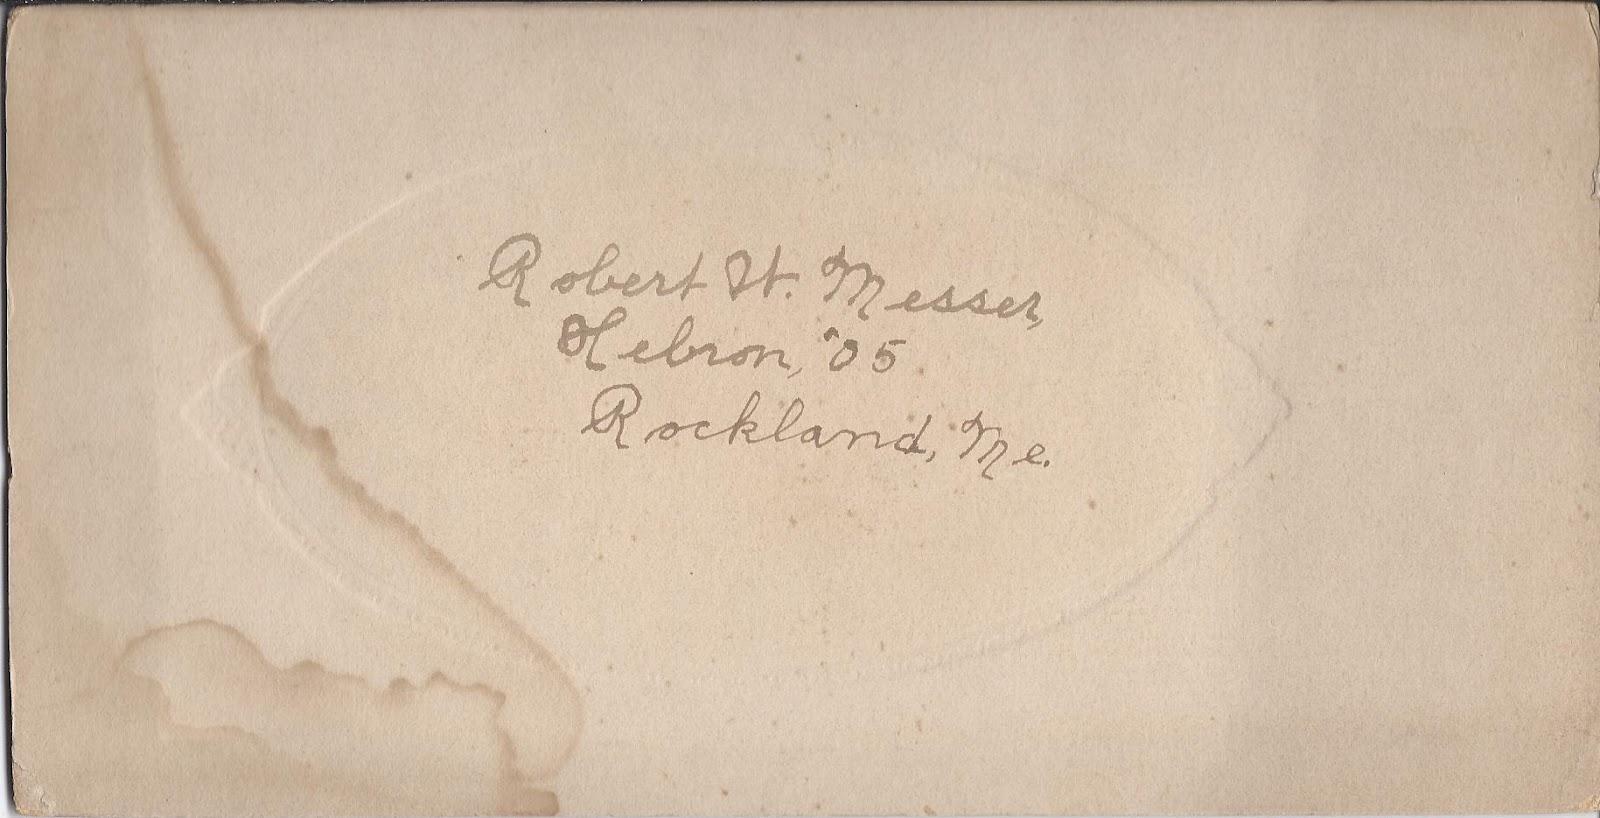 Heirlooms Reunited: 1905 Graduation Photograph Of Robert W